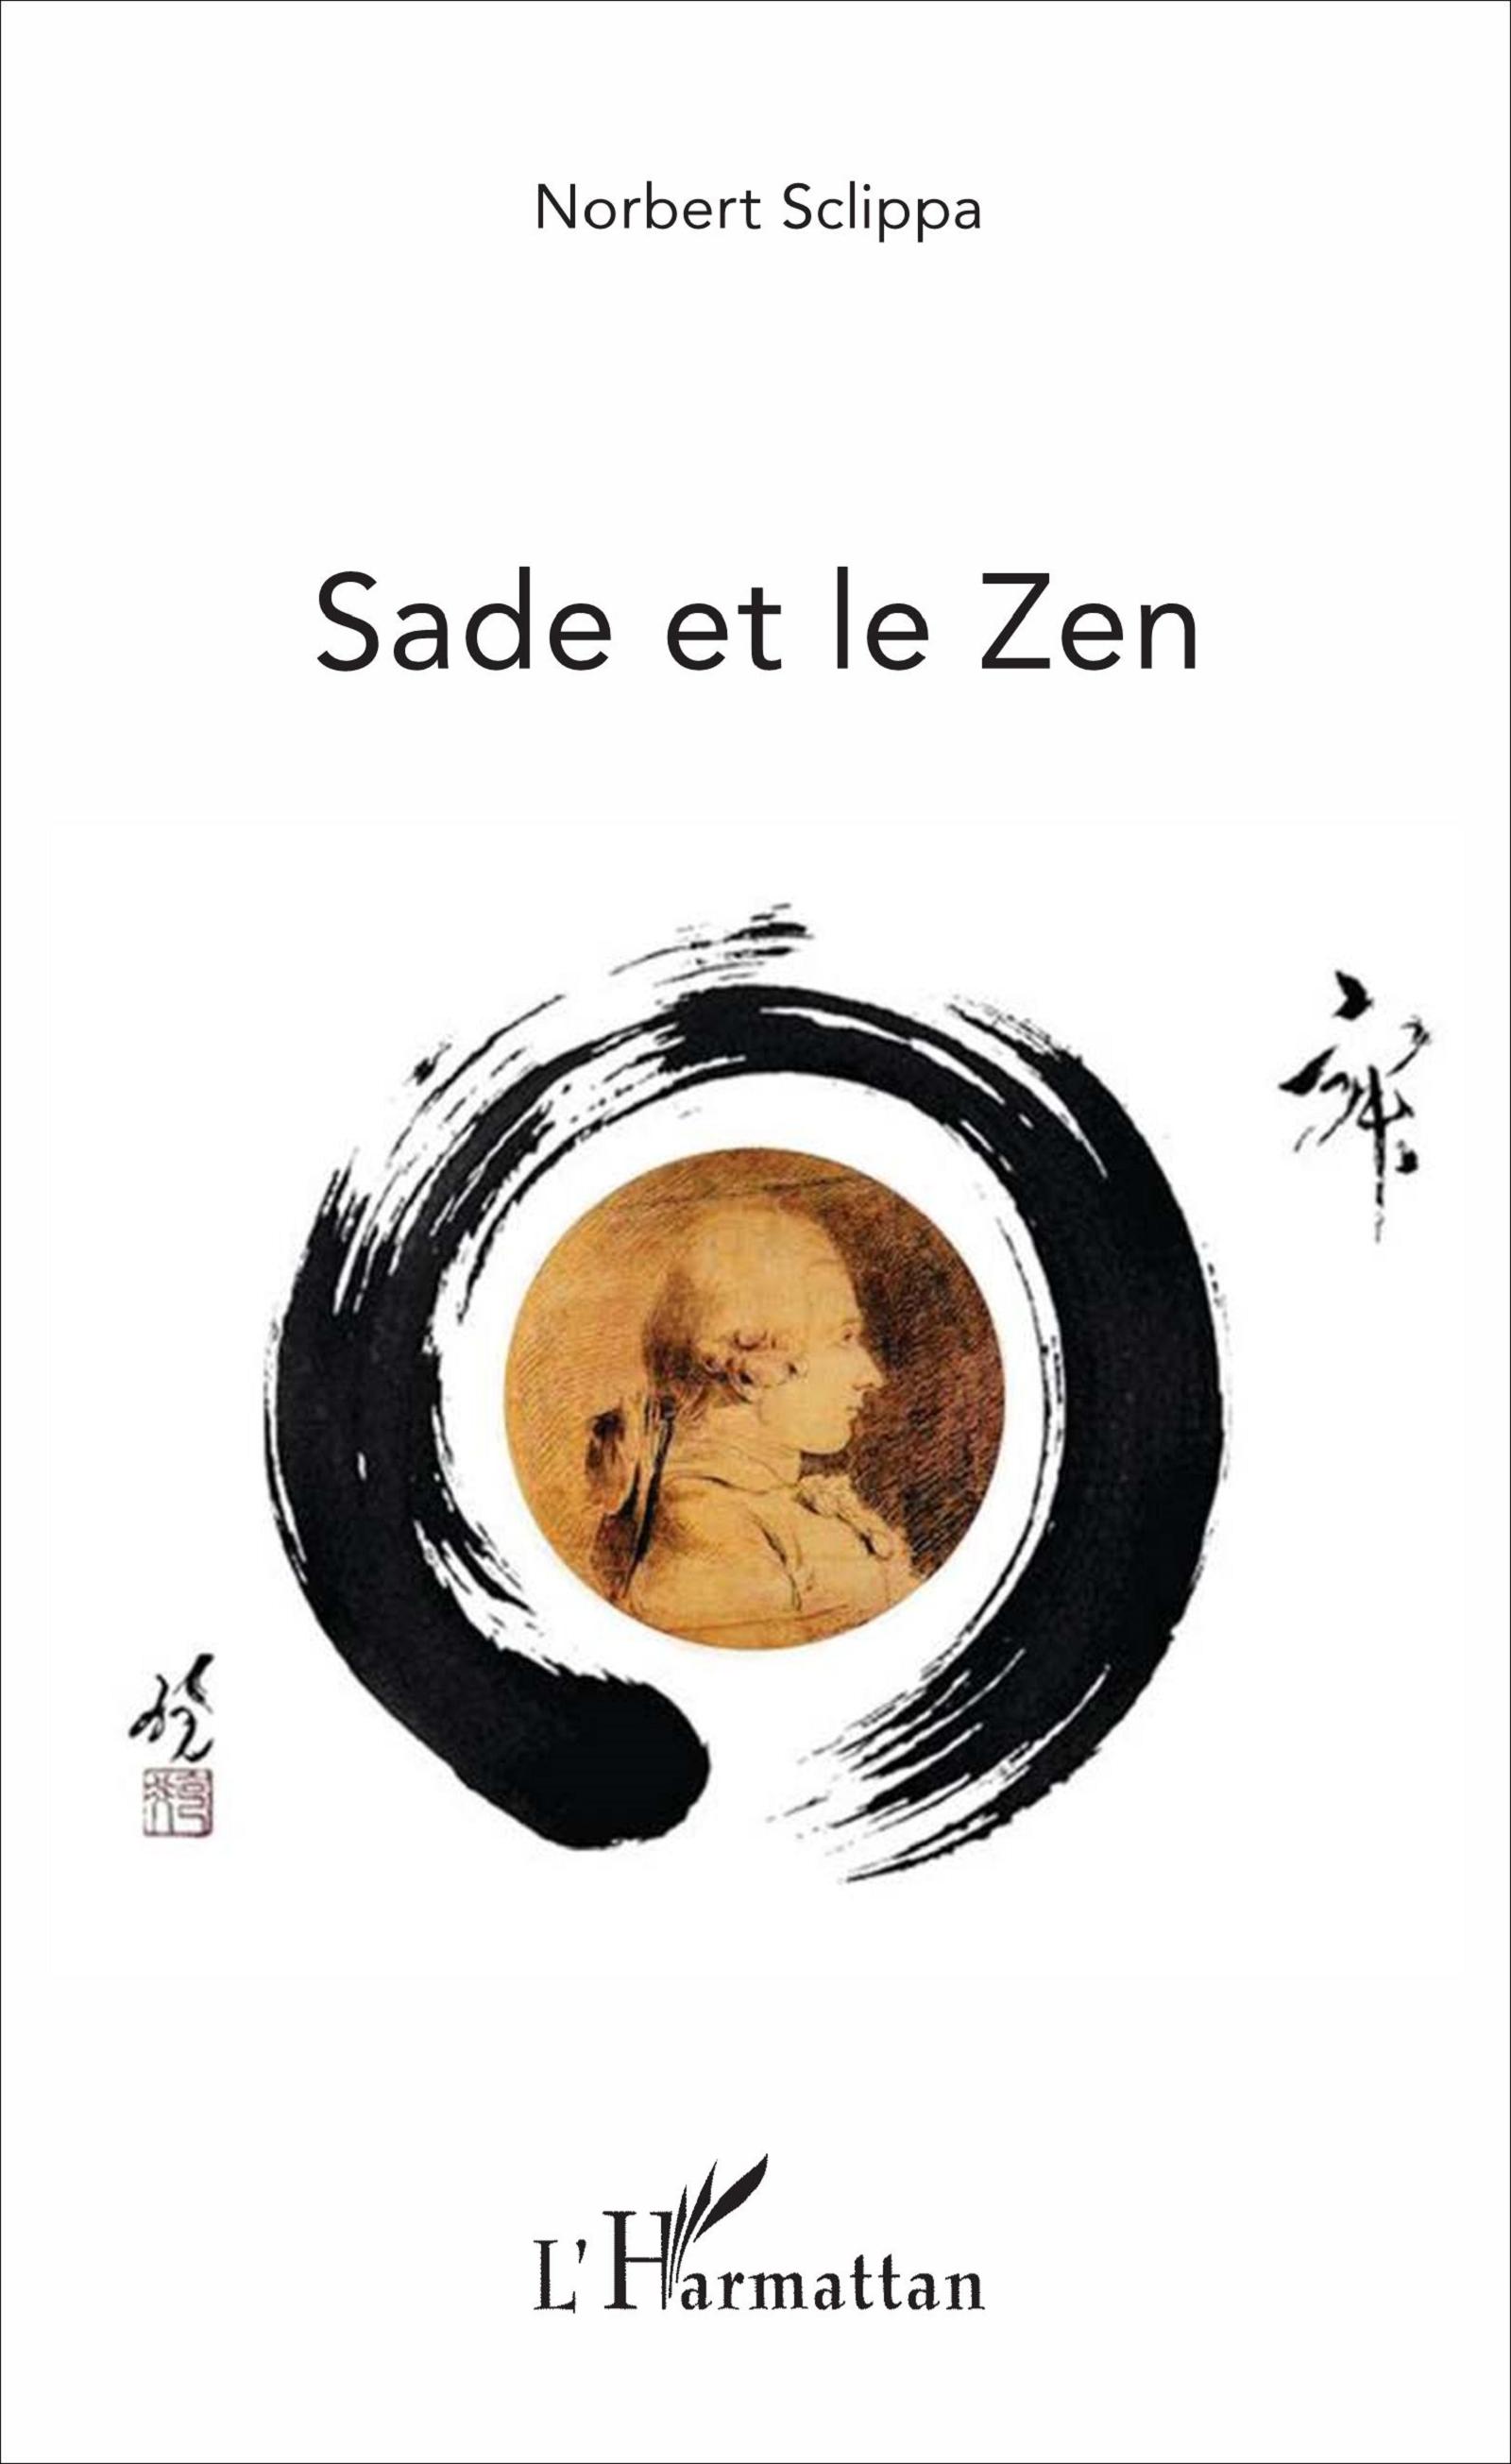 N. Sclippa, Sade et le Zen